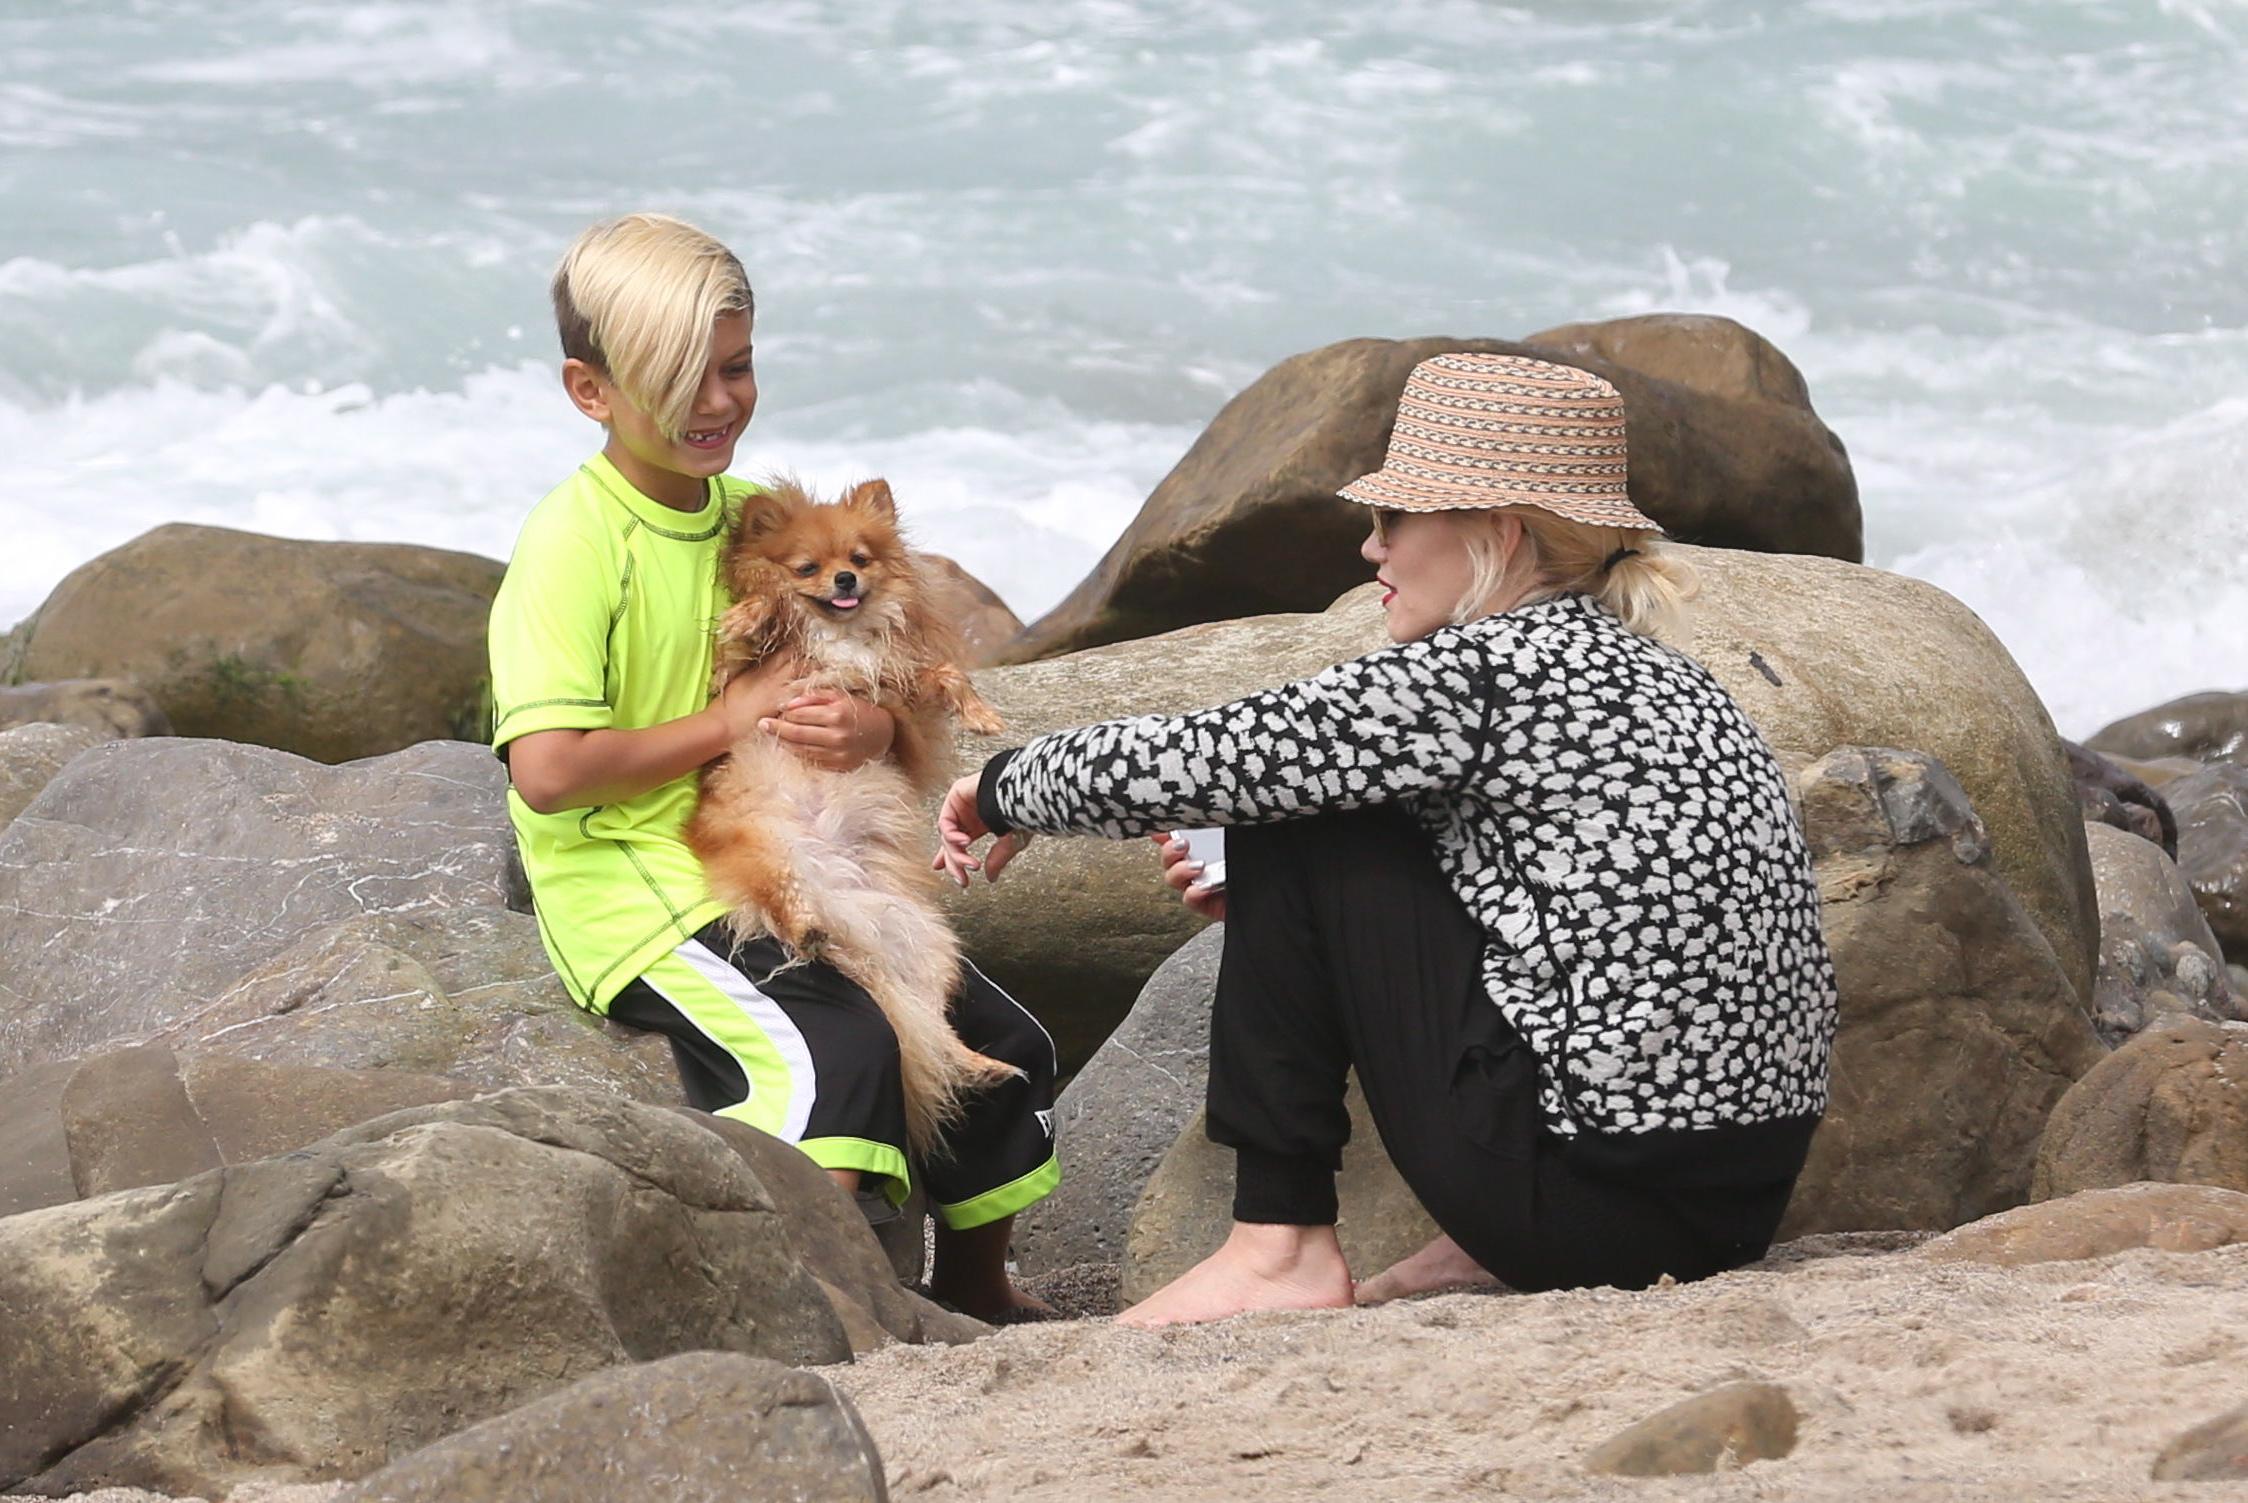 exclusive-gwen-stefani-has-a-fun-beach-day-with-kingston-and-zuma-part-2.bin